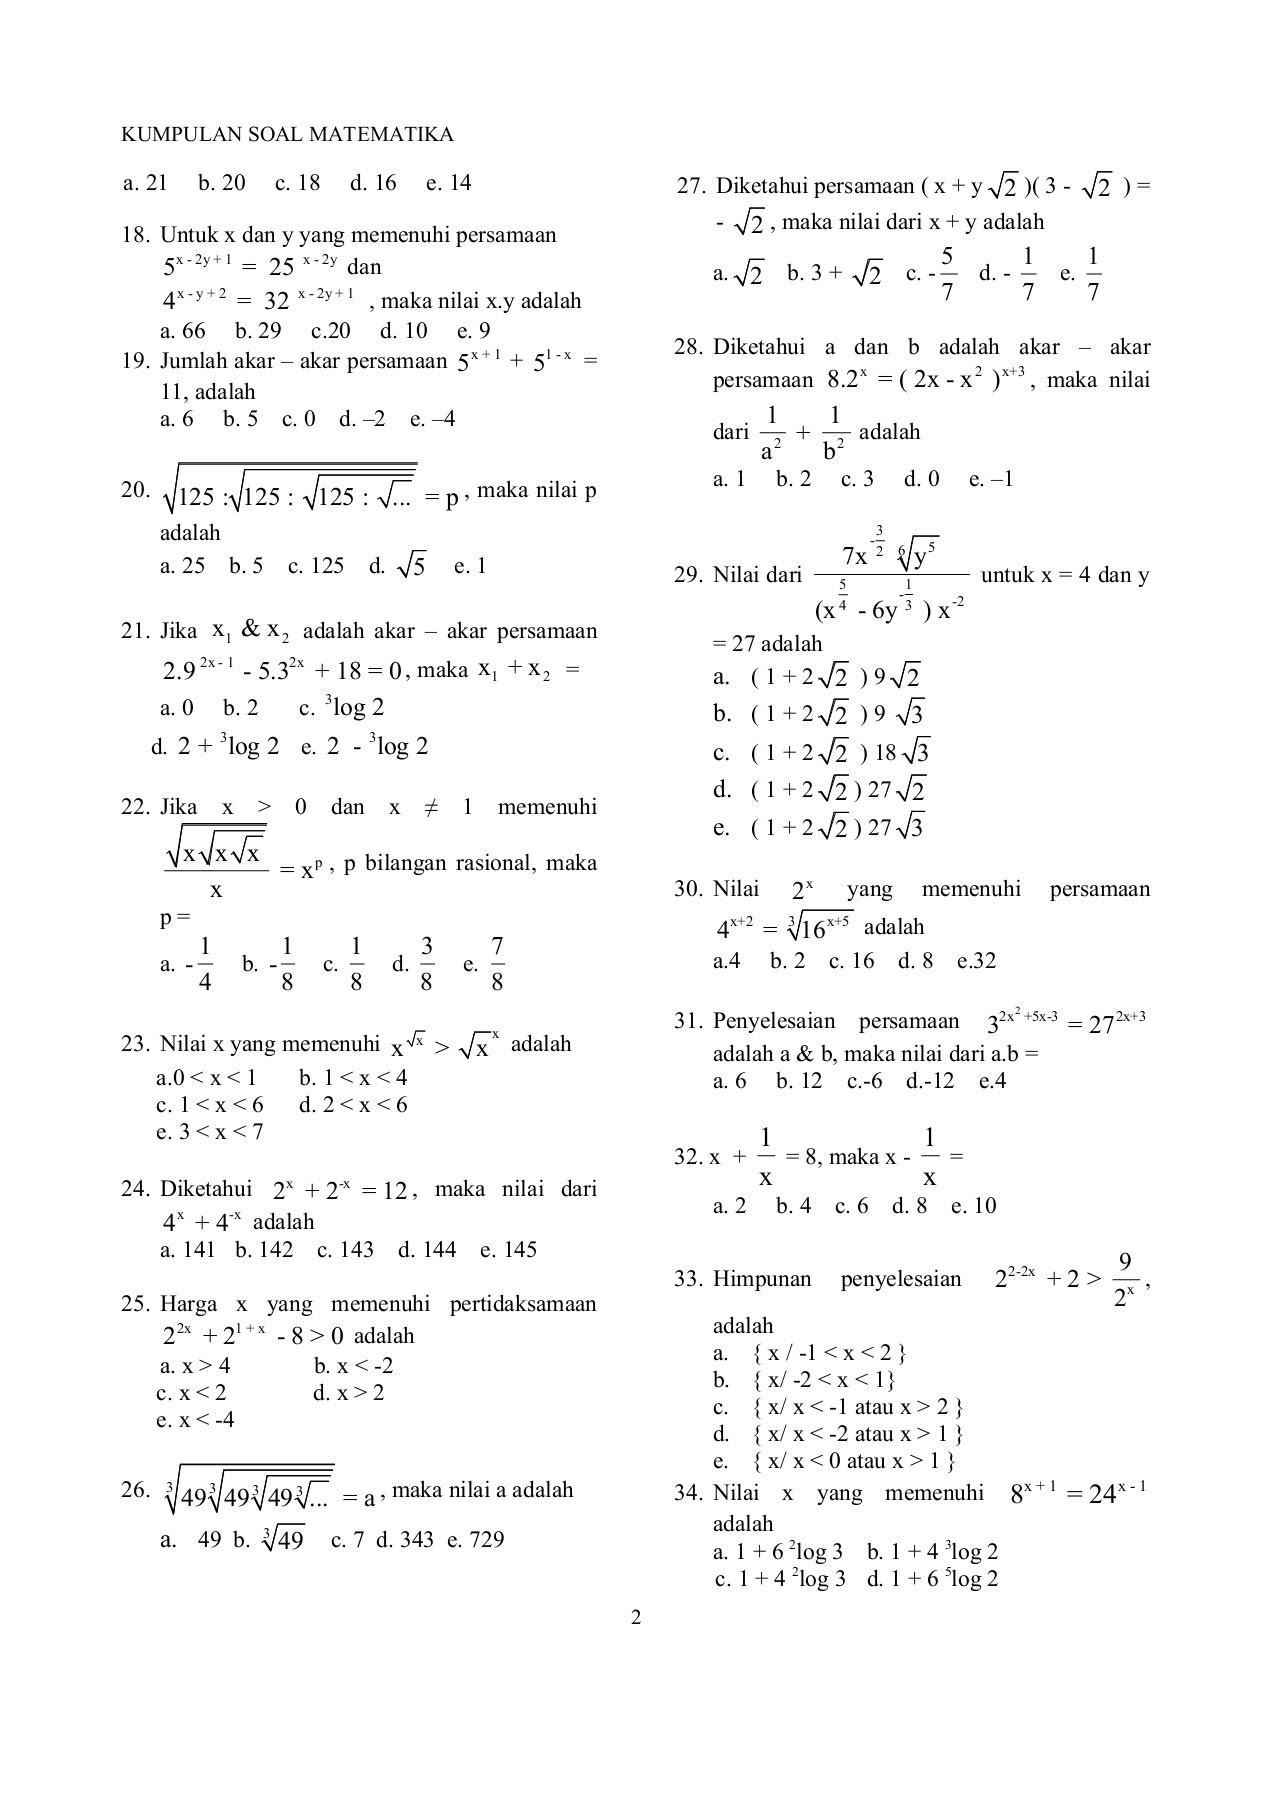 Modul Matematika Kumpulan Soal Akhir Kelas X XI XII Pages 1 50 Text Version